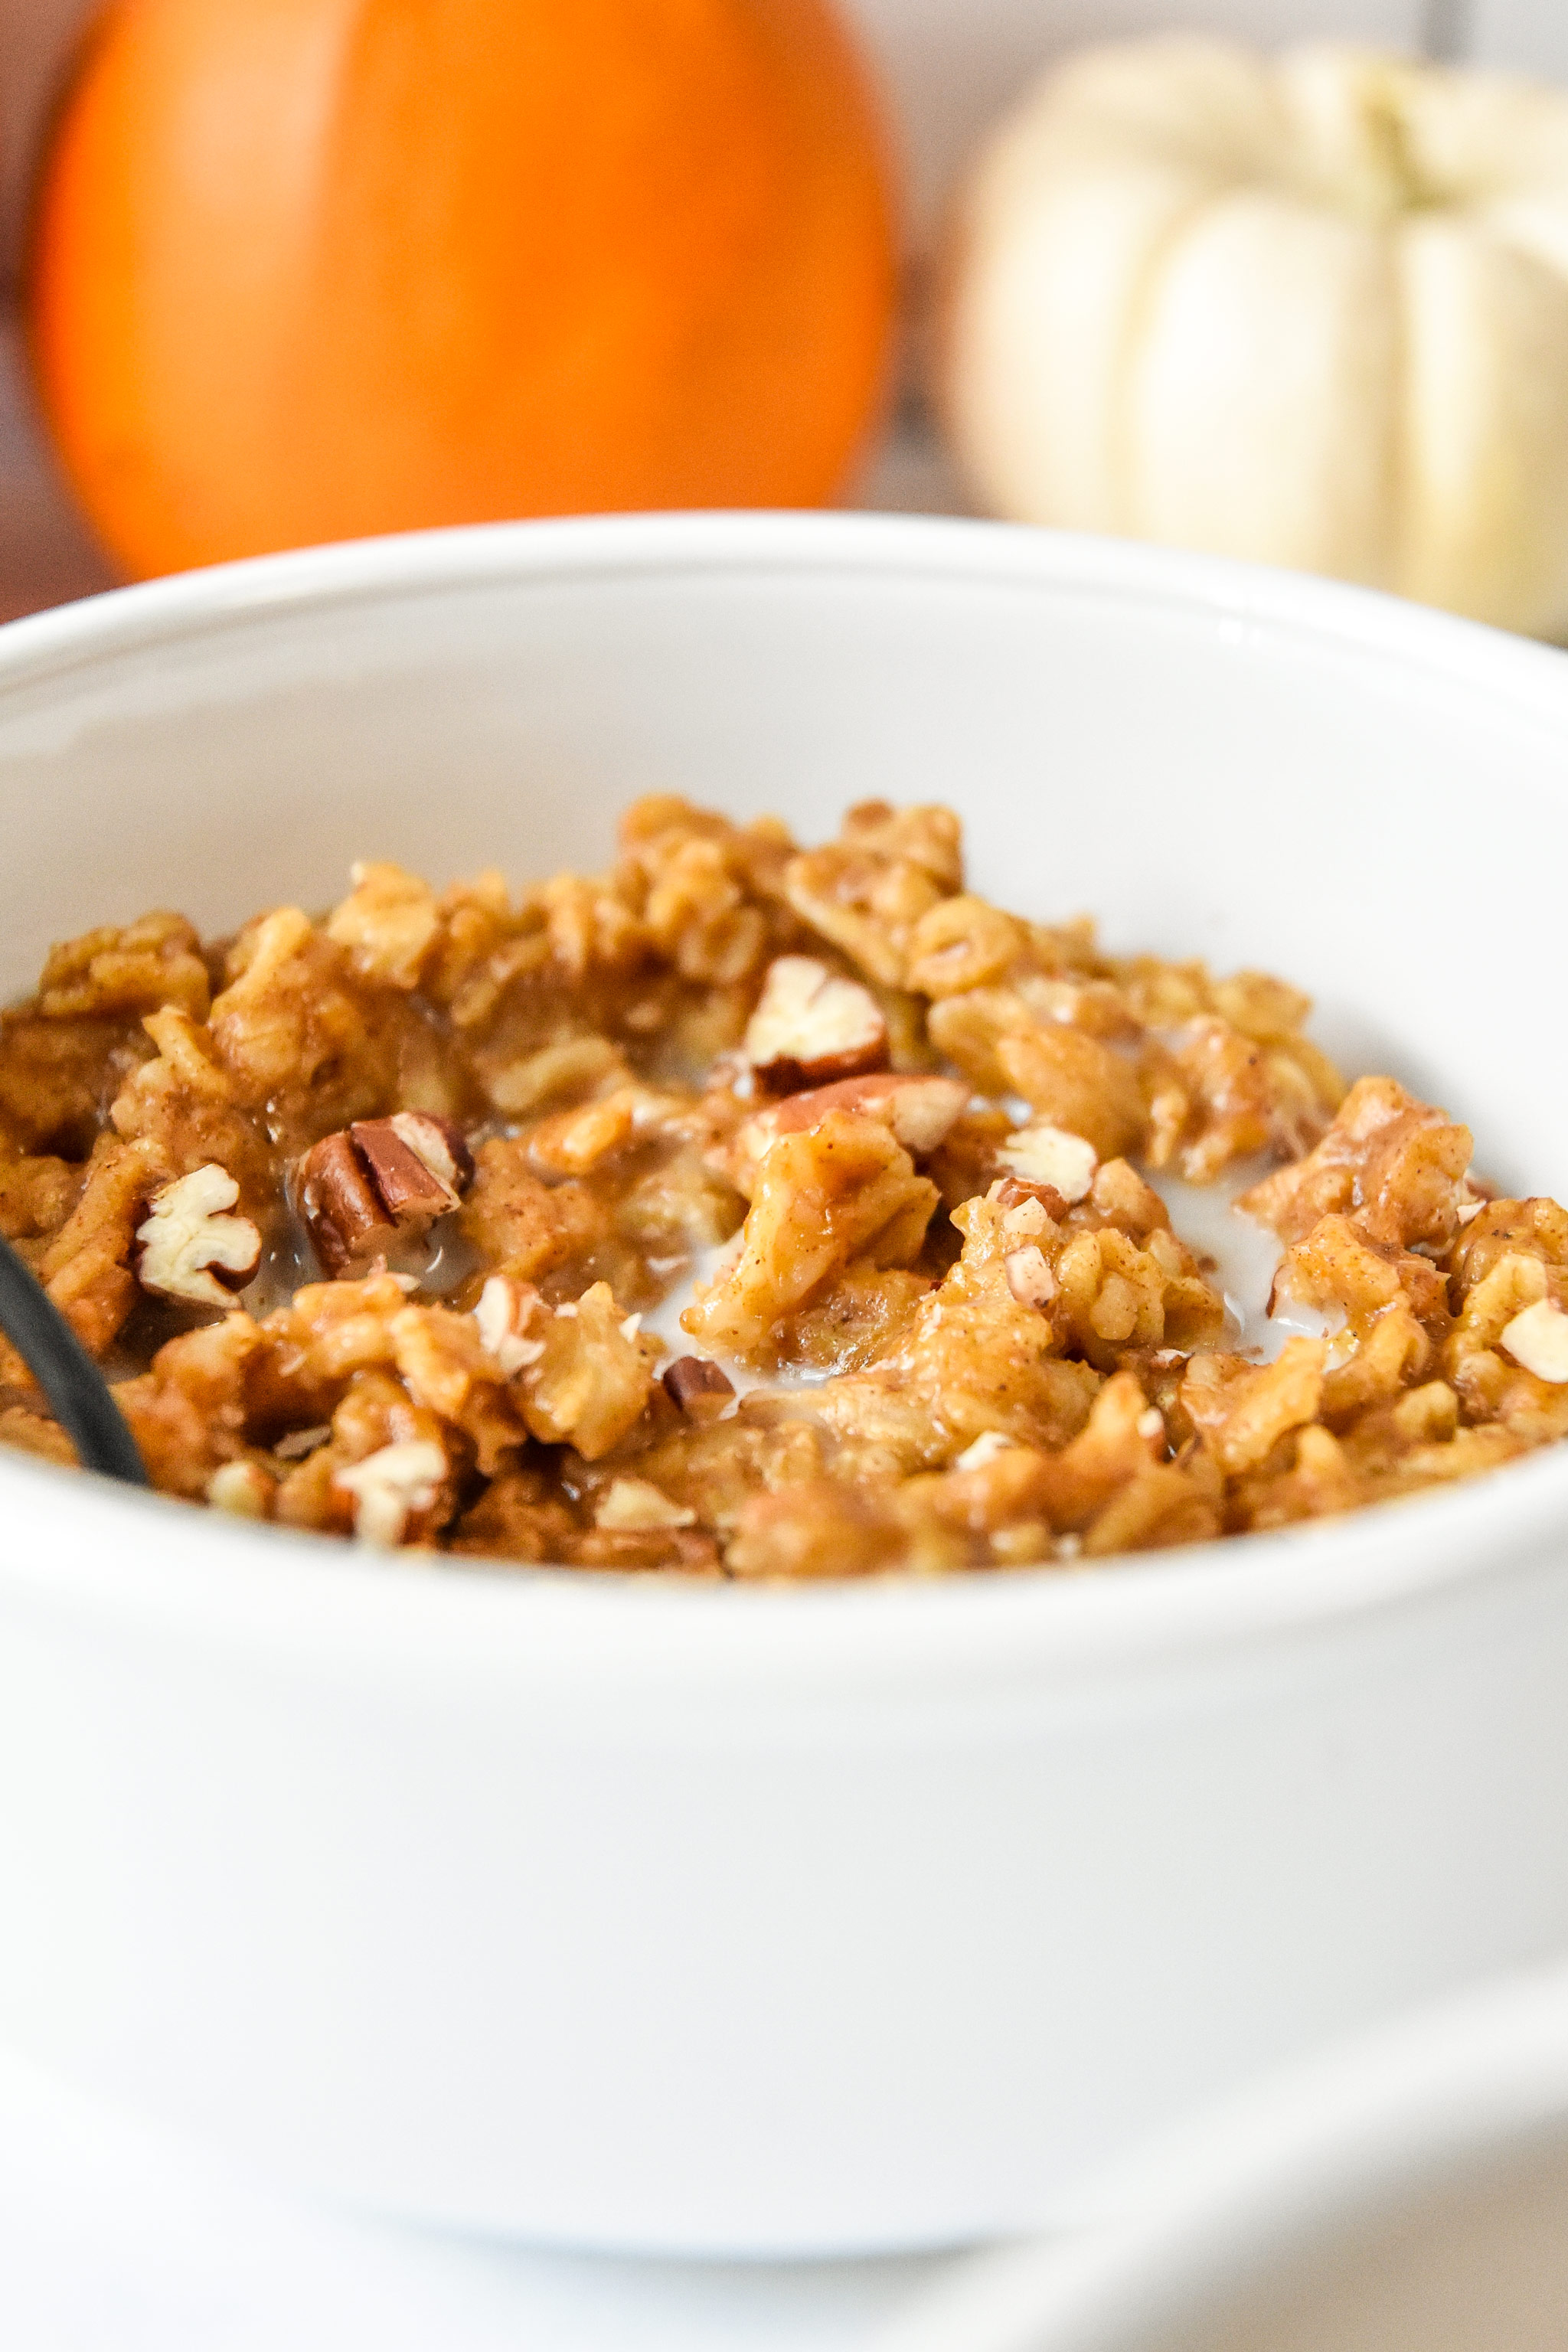 bowl of oatmeal.